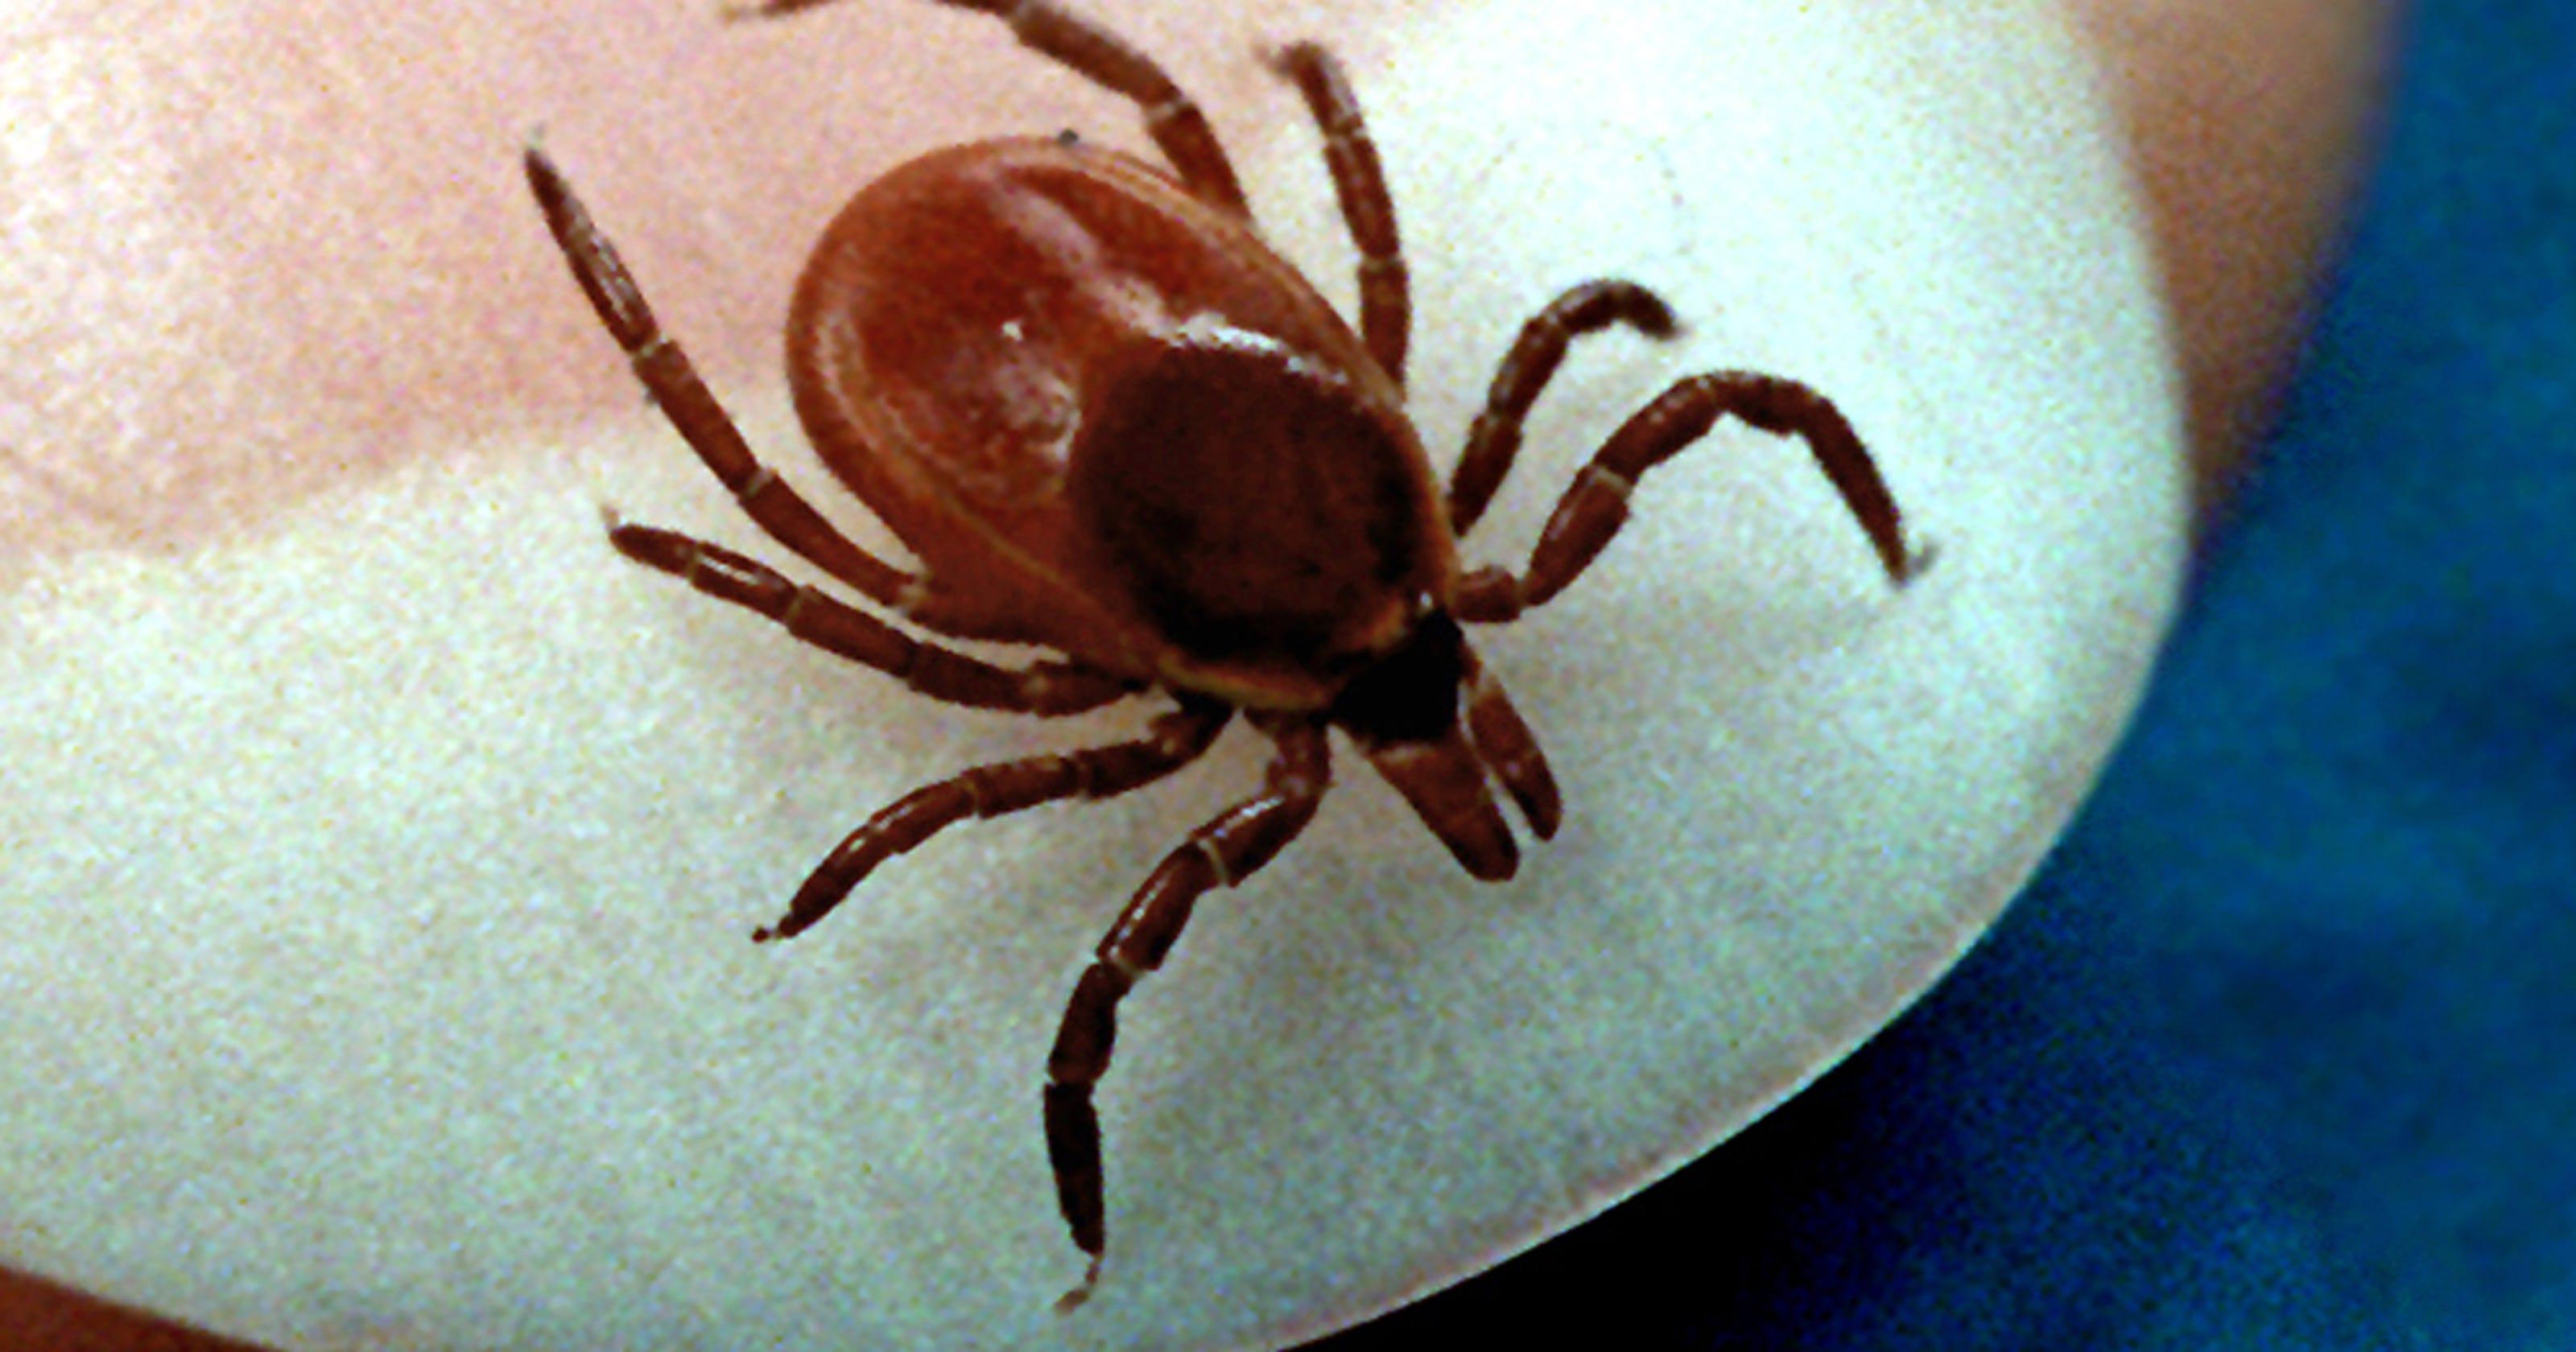 Tick season resumes in Iowa, as Lyme disease threat surges